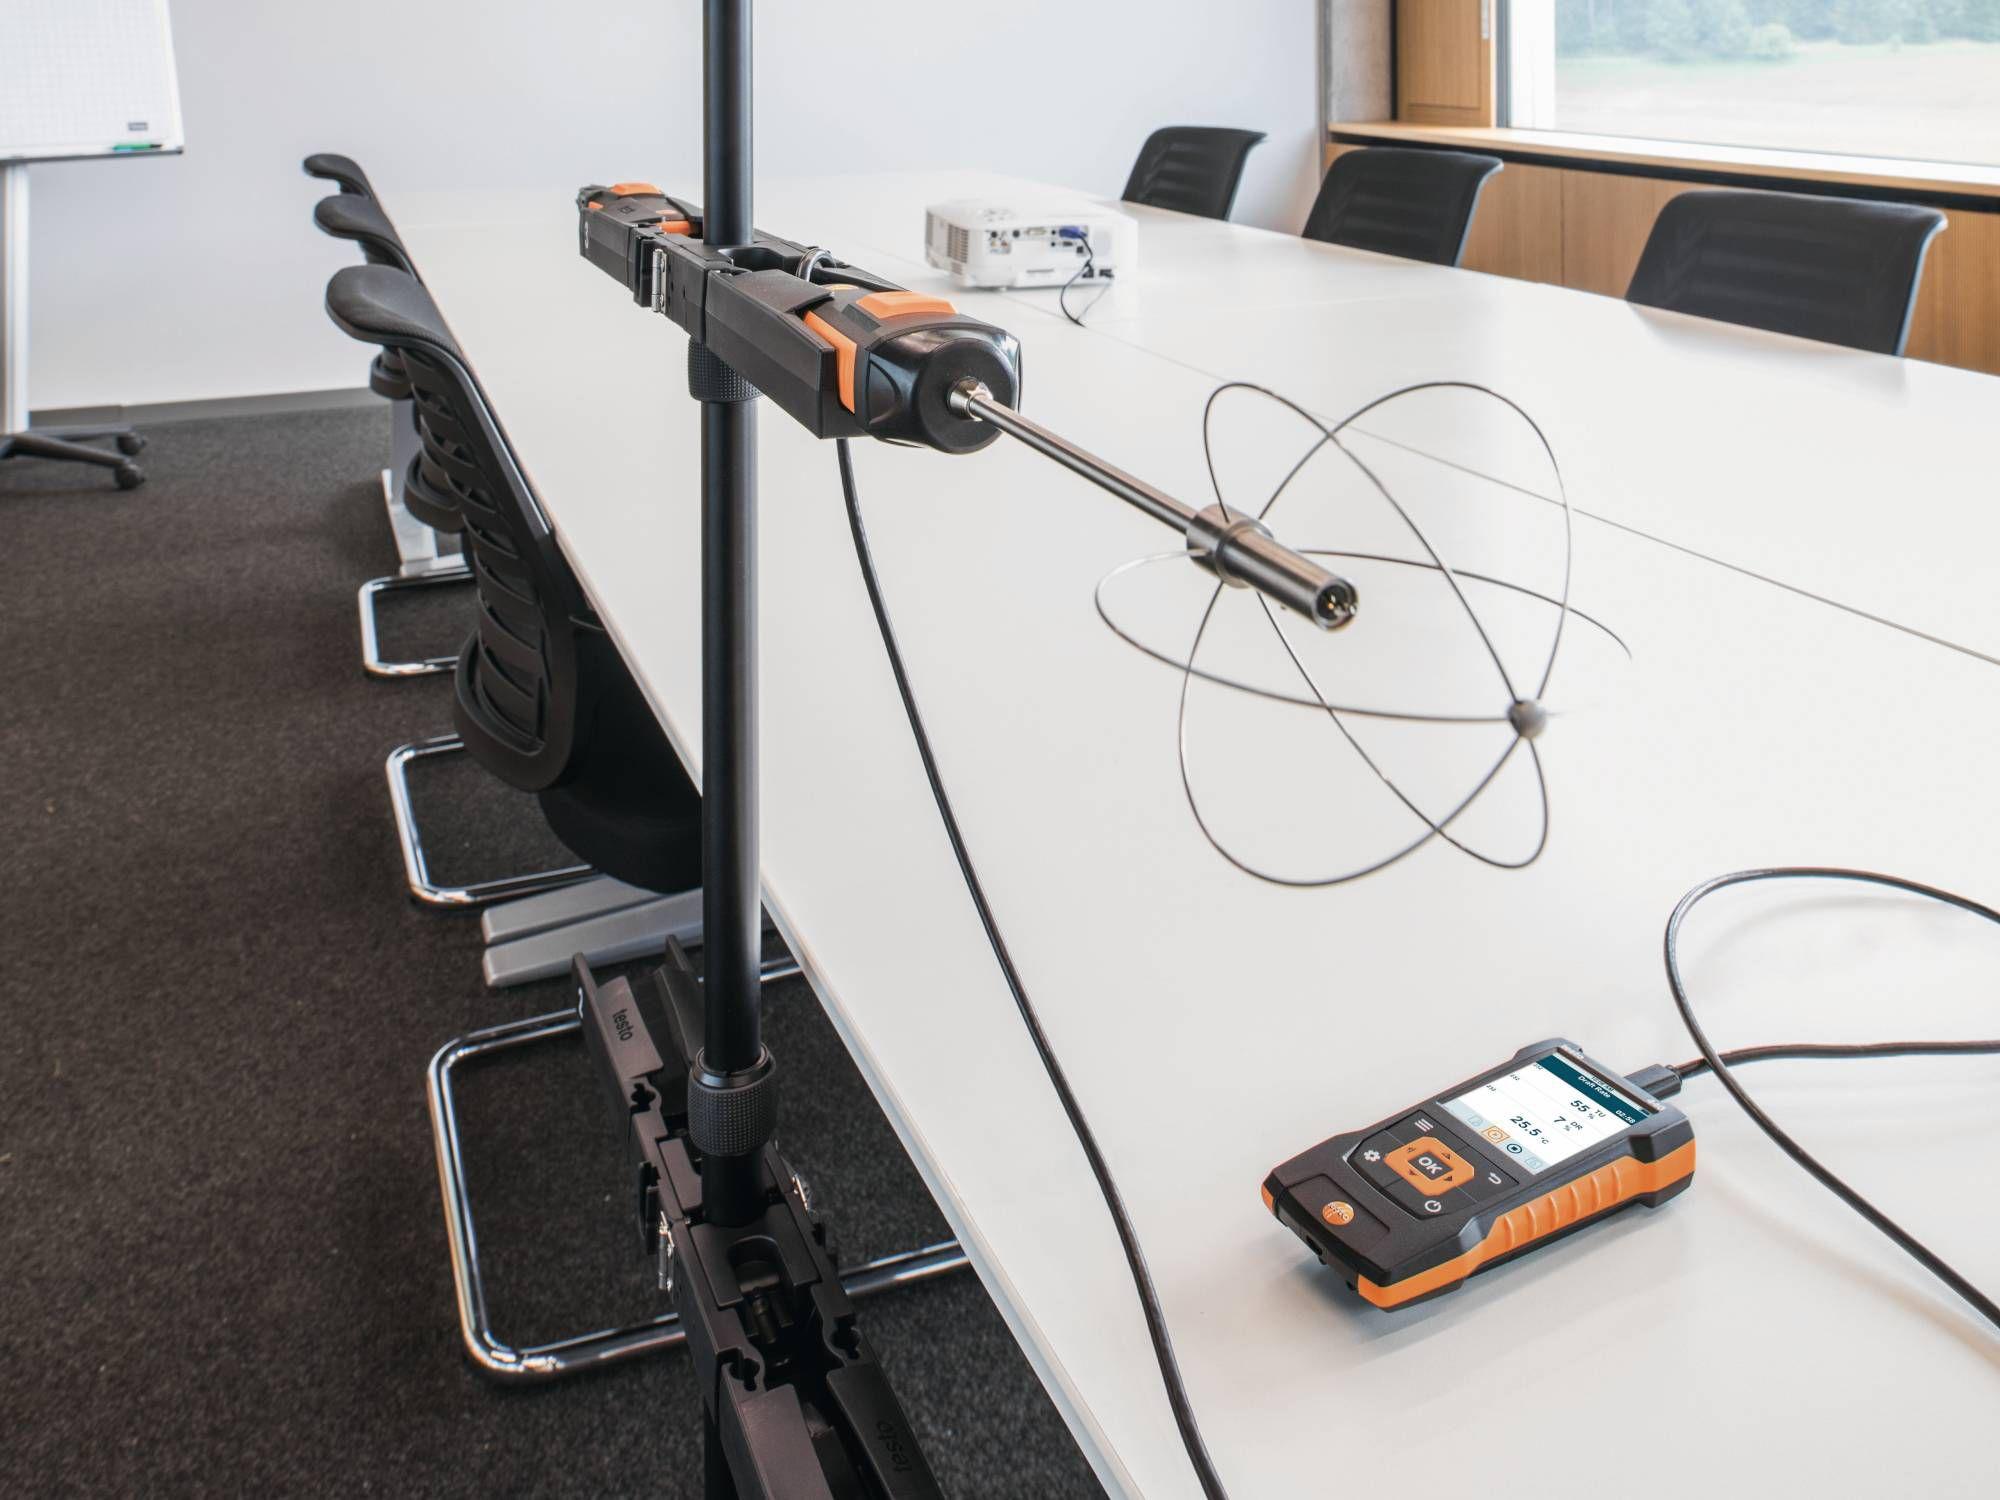 testo-440-Turbulence-probe-fixed-cable-en-2000x1500.jpg